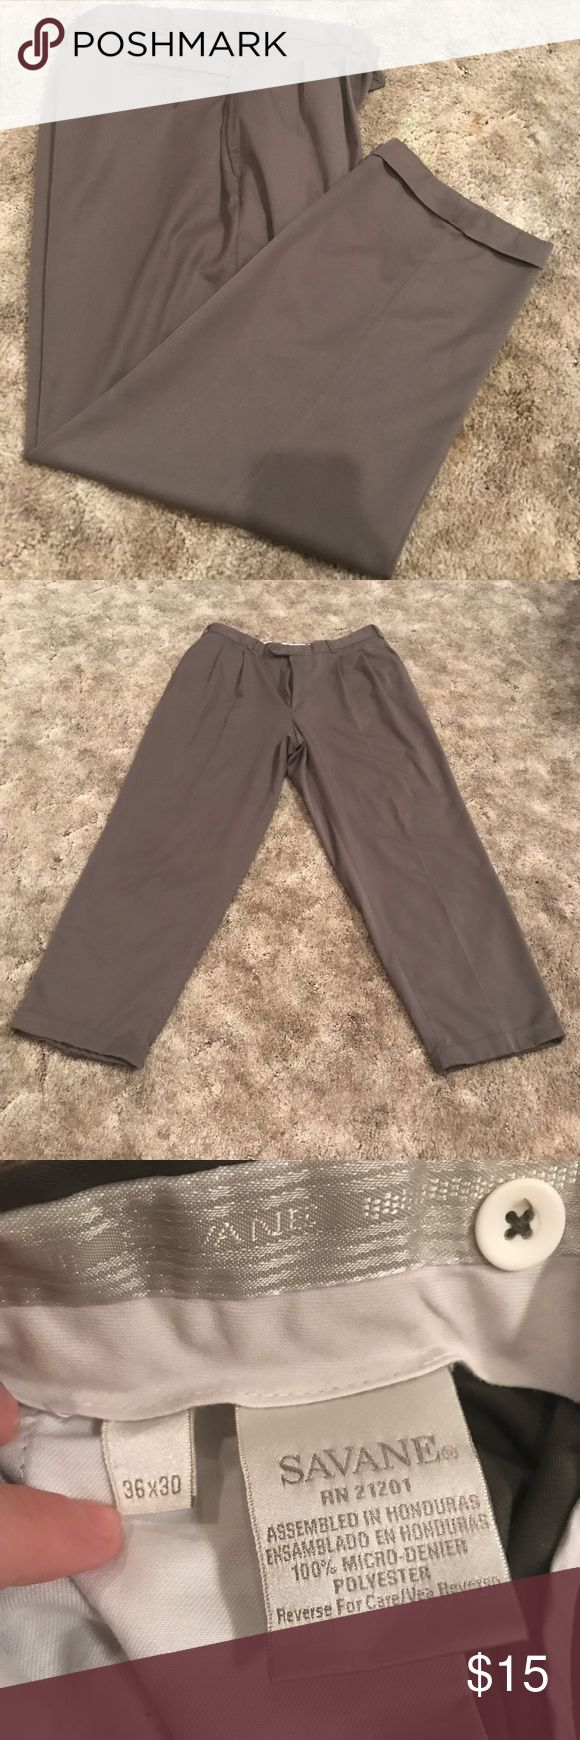 Savane dress pants Gently used! Color: Olive drab Size: 36 x 30 Savane Pants Dress